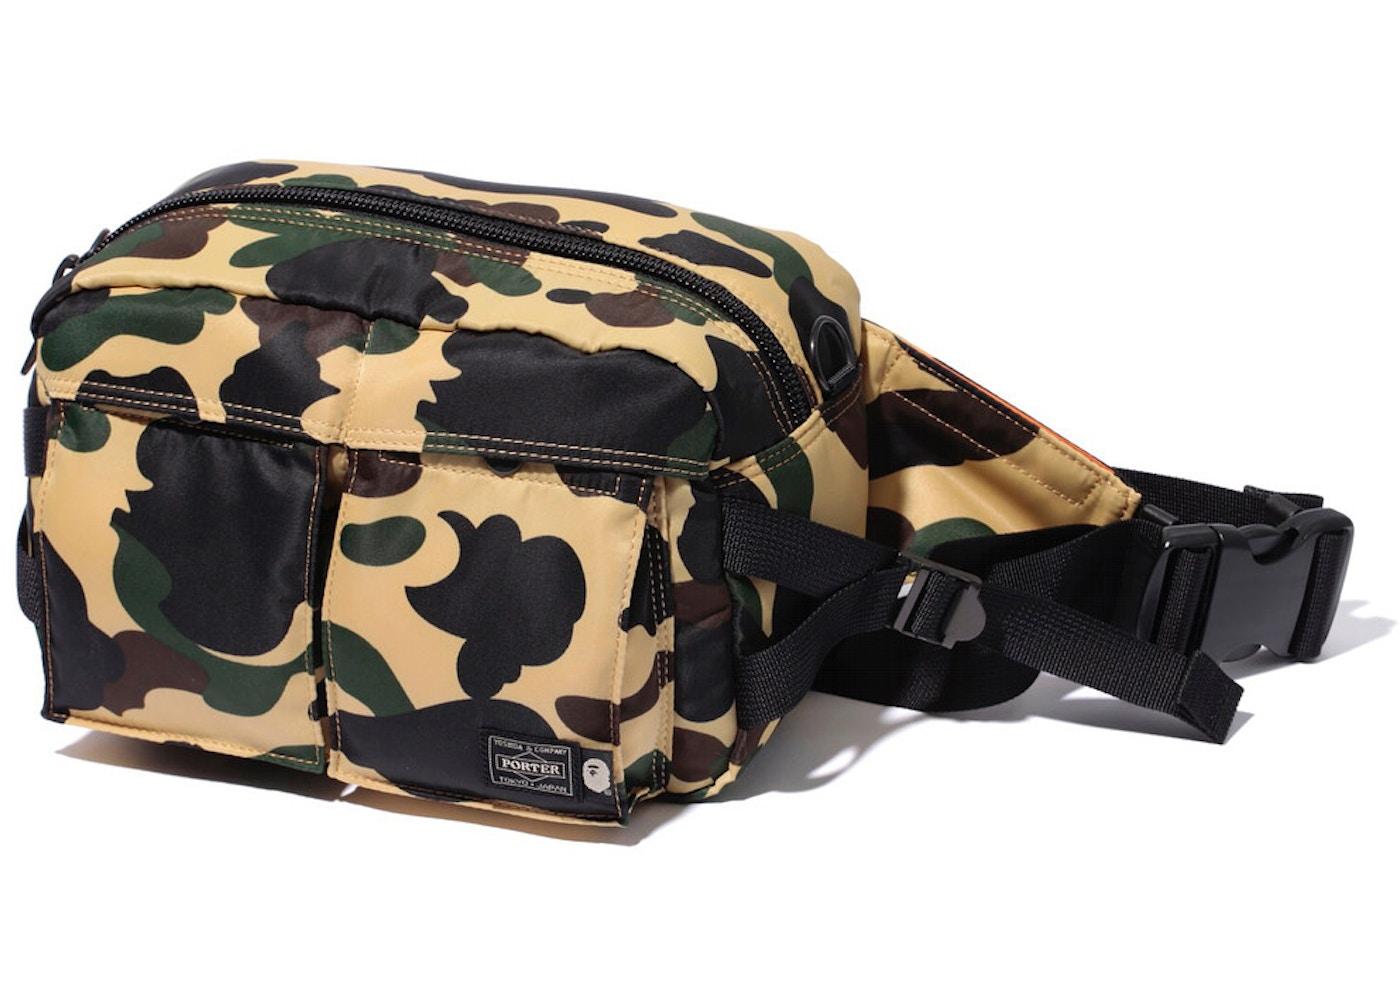 c70f202e Streetwear - Bape Bags - Total Sold